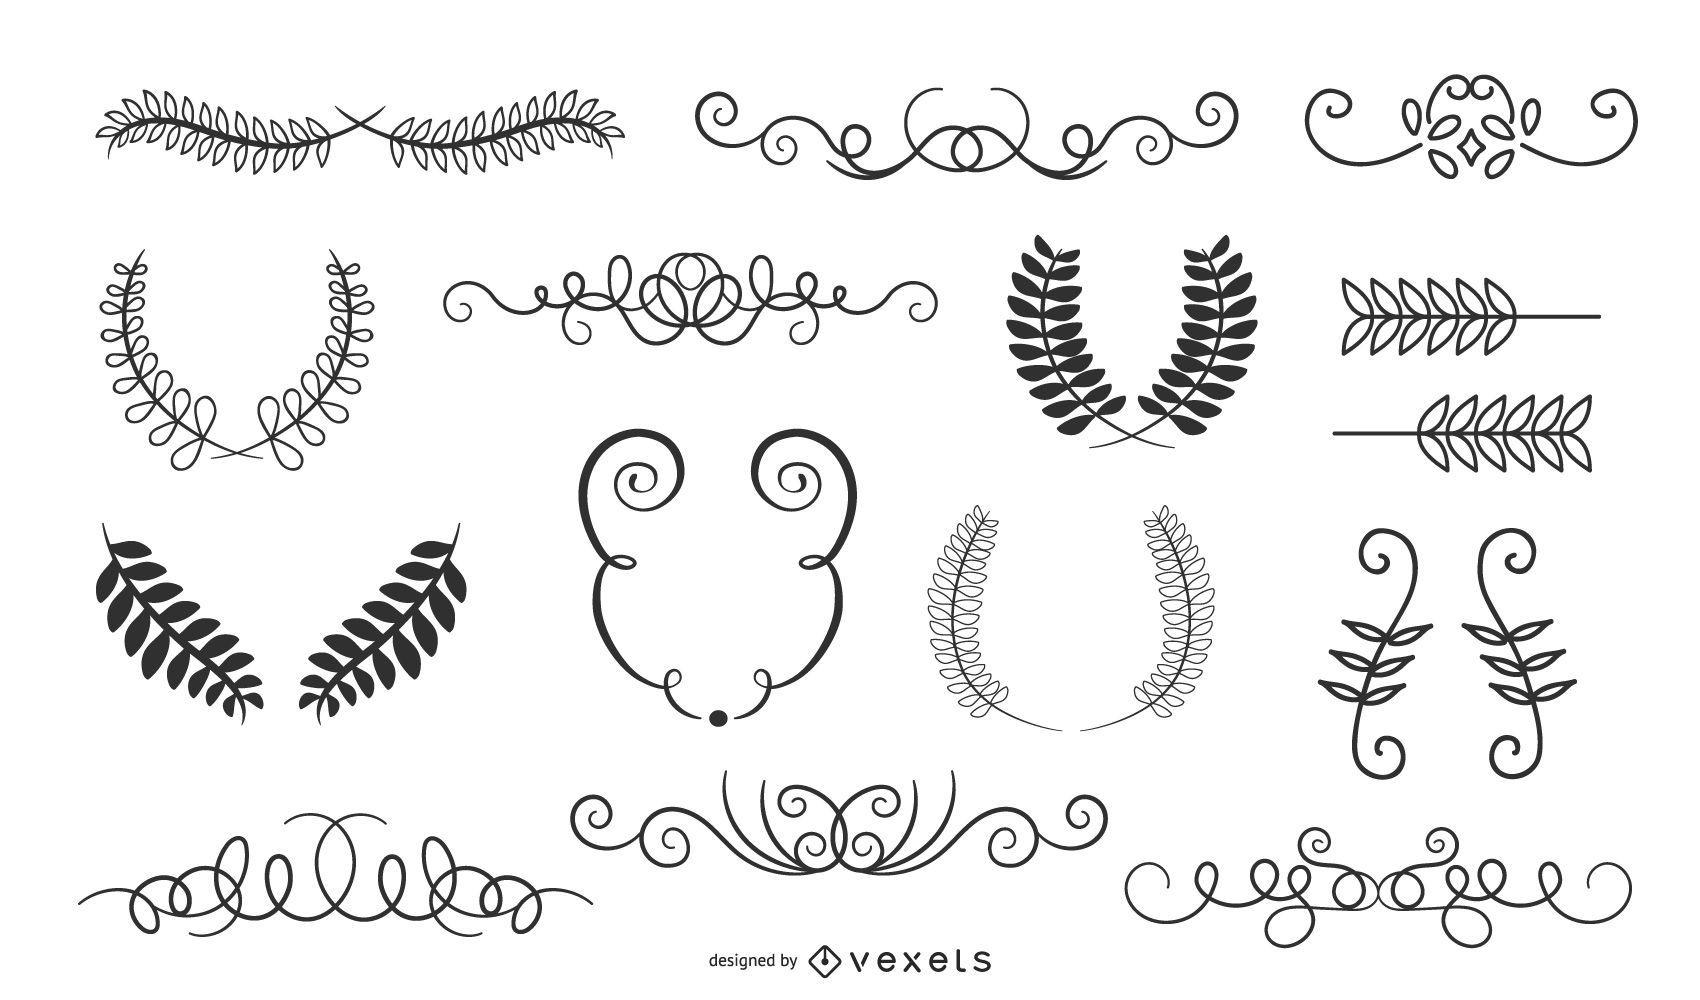 Hand Drawn Vintage Border Ornaments